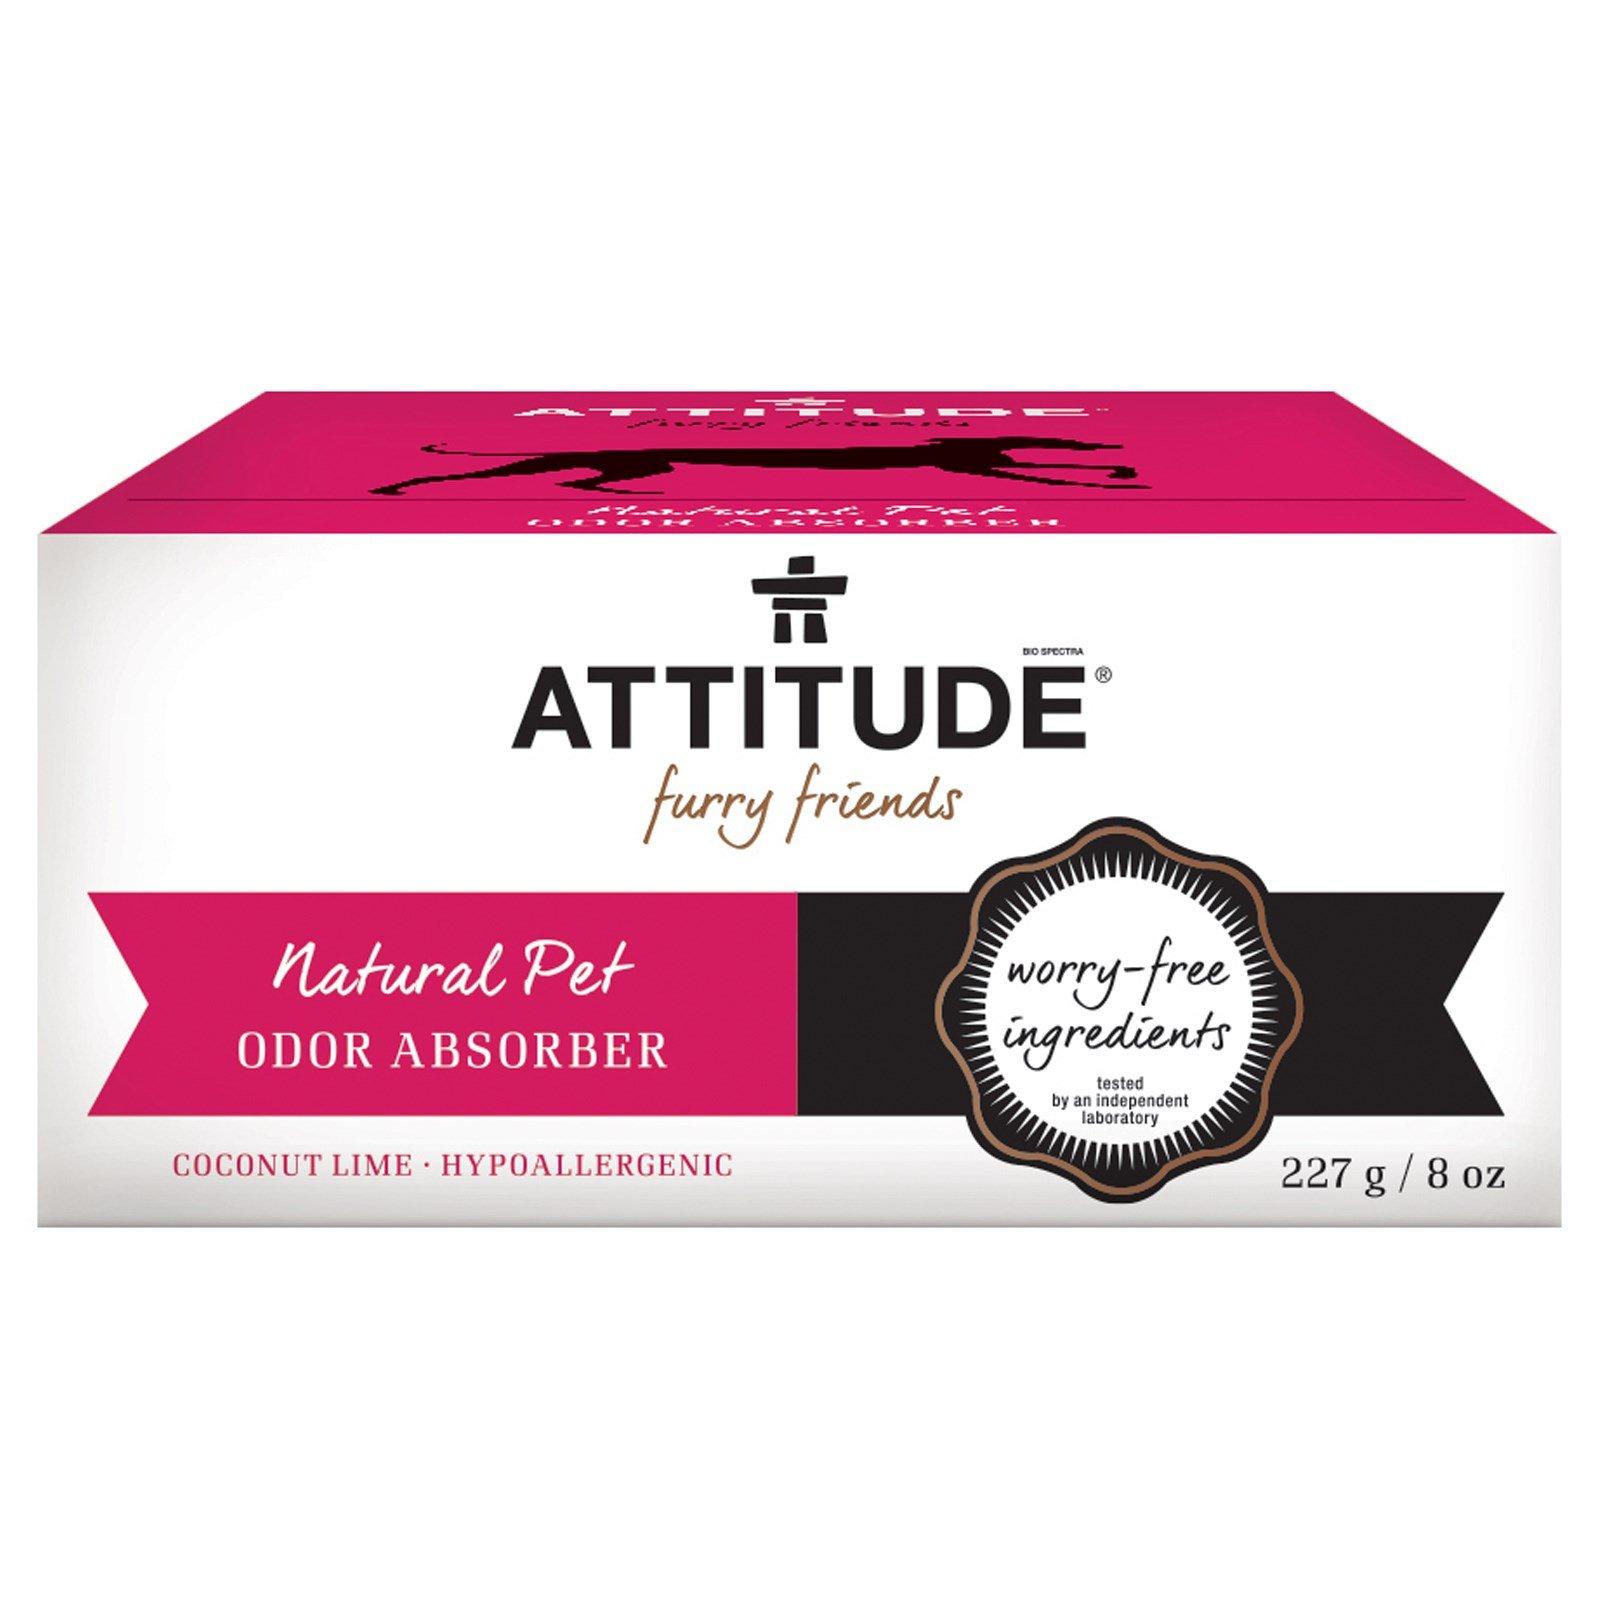 Attitude, Furry Friends, Natural Pet Odor Absorber, Coconut Lime, 8 oz (227 g) - 2PC